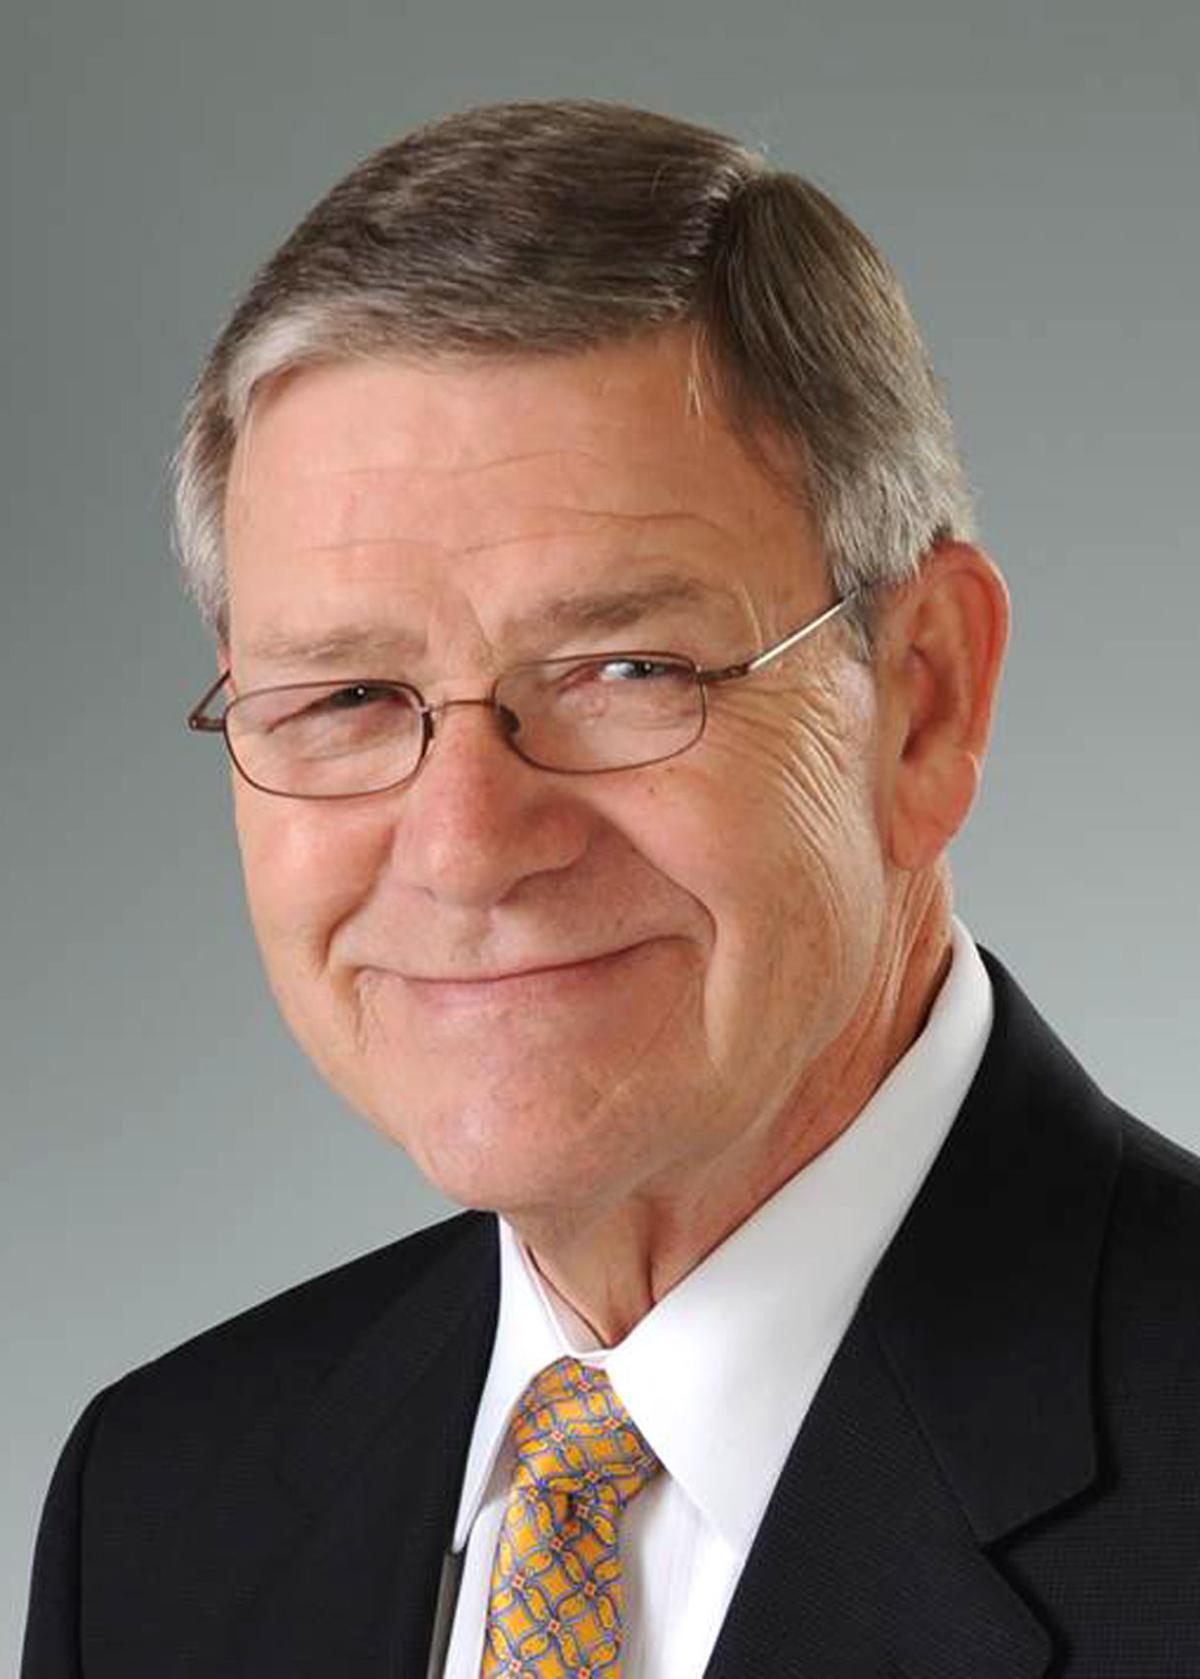 Ed Gaunch